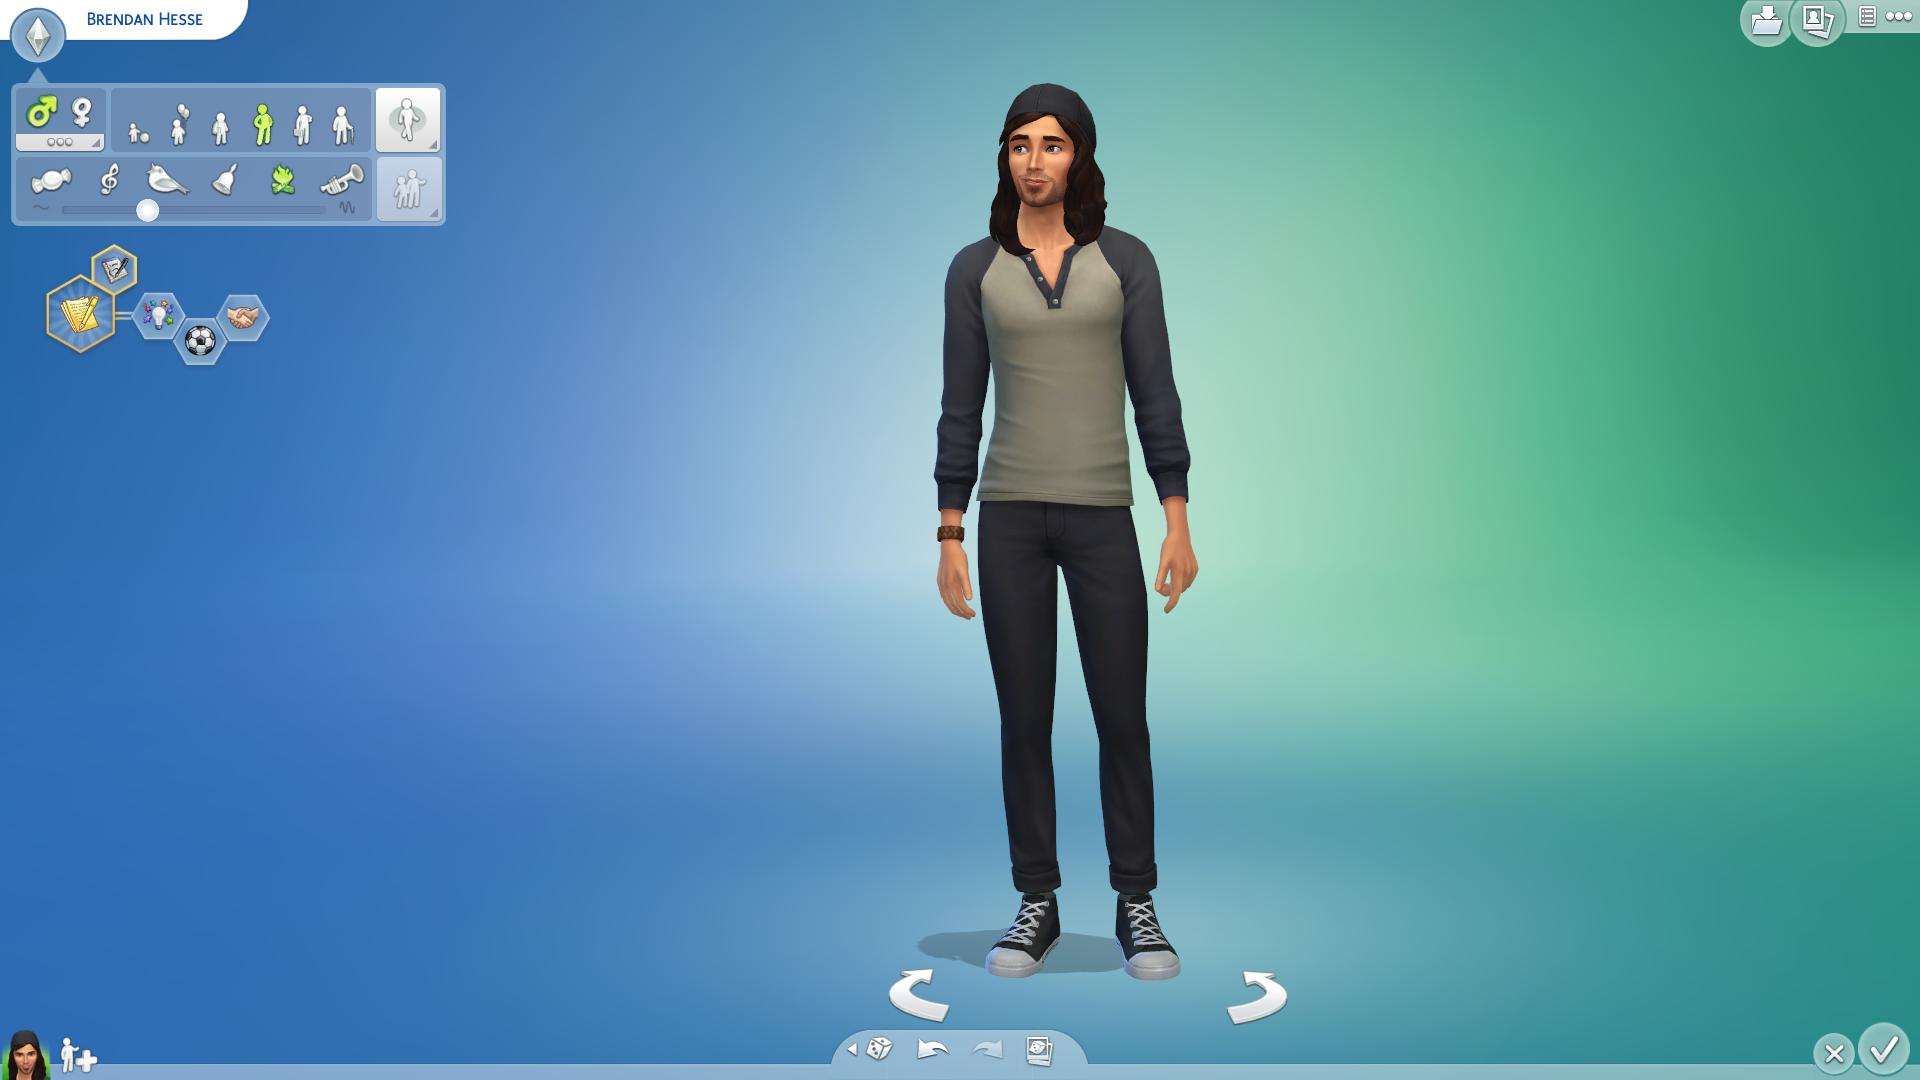 Download 'The Sims 4' For Free Right Now | Lifehacker Australia